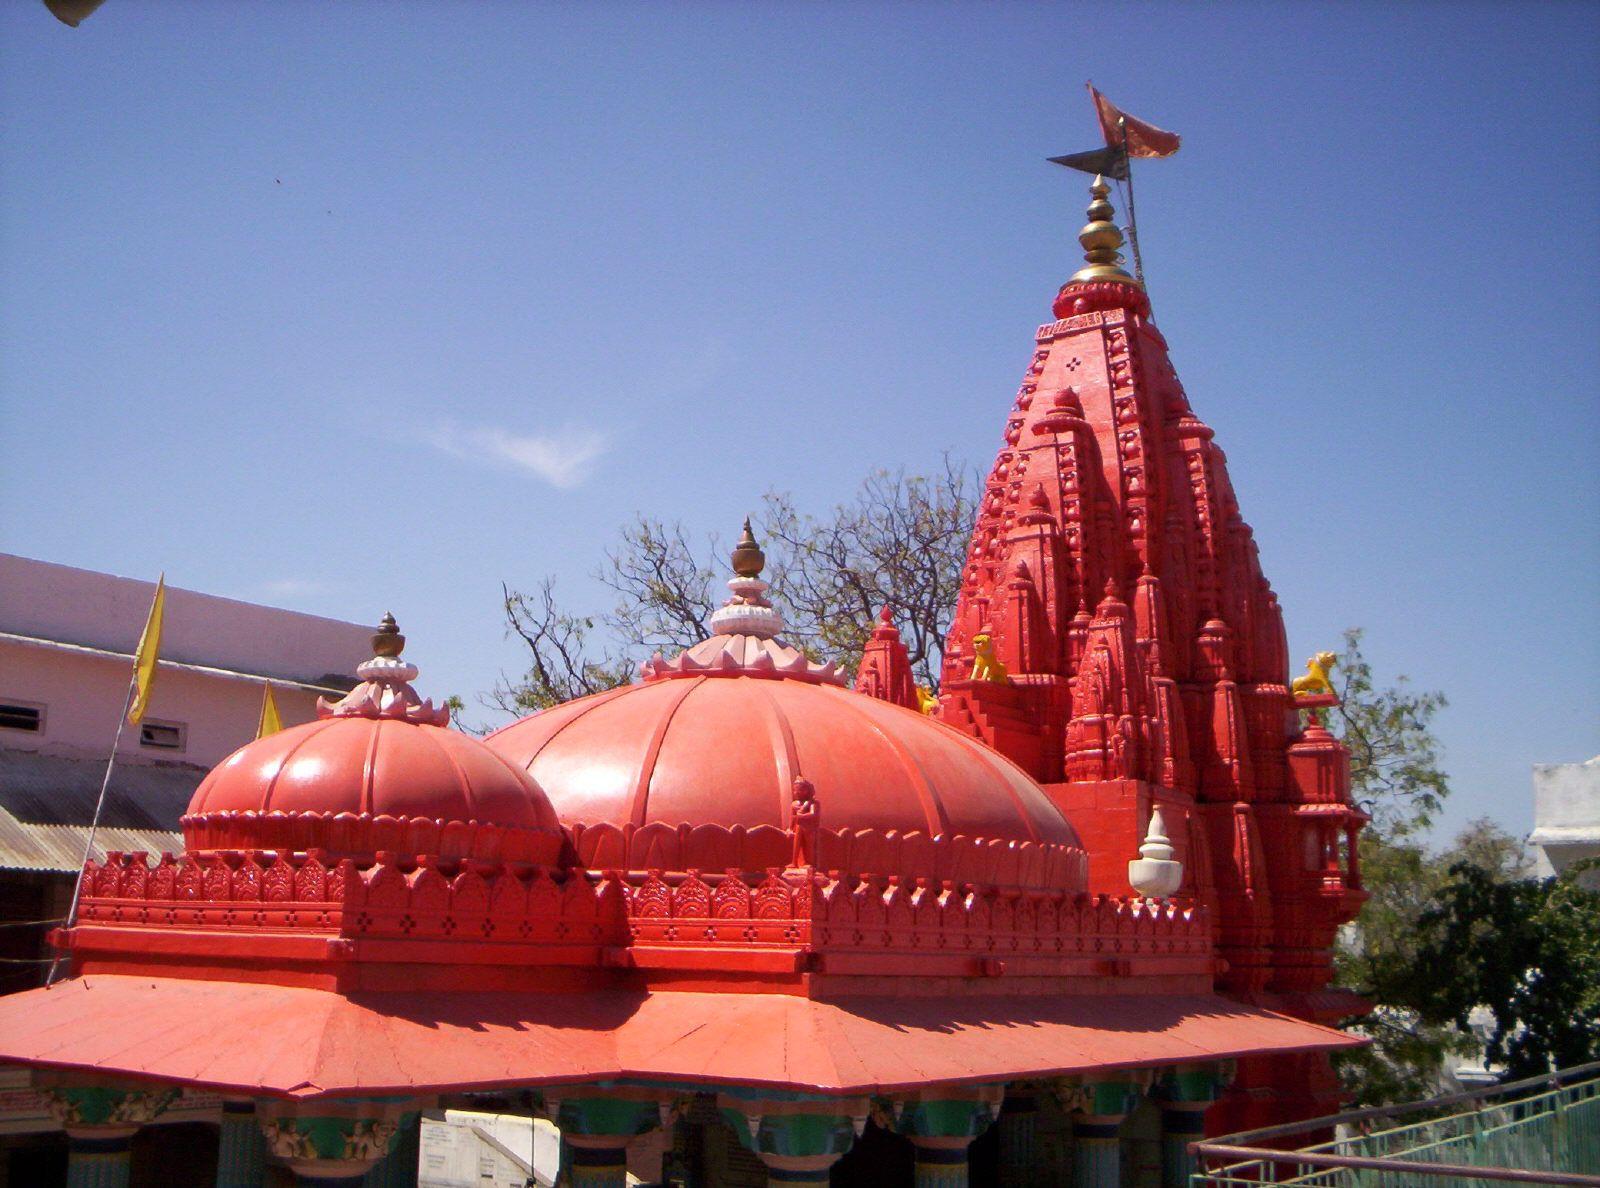 Brahma temple in Pushkar